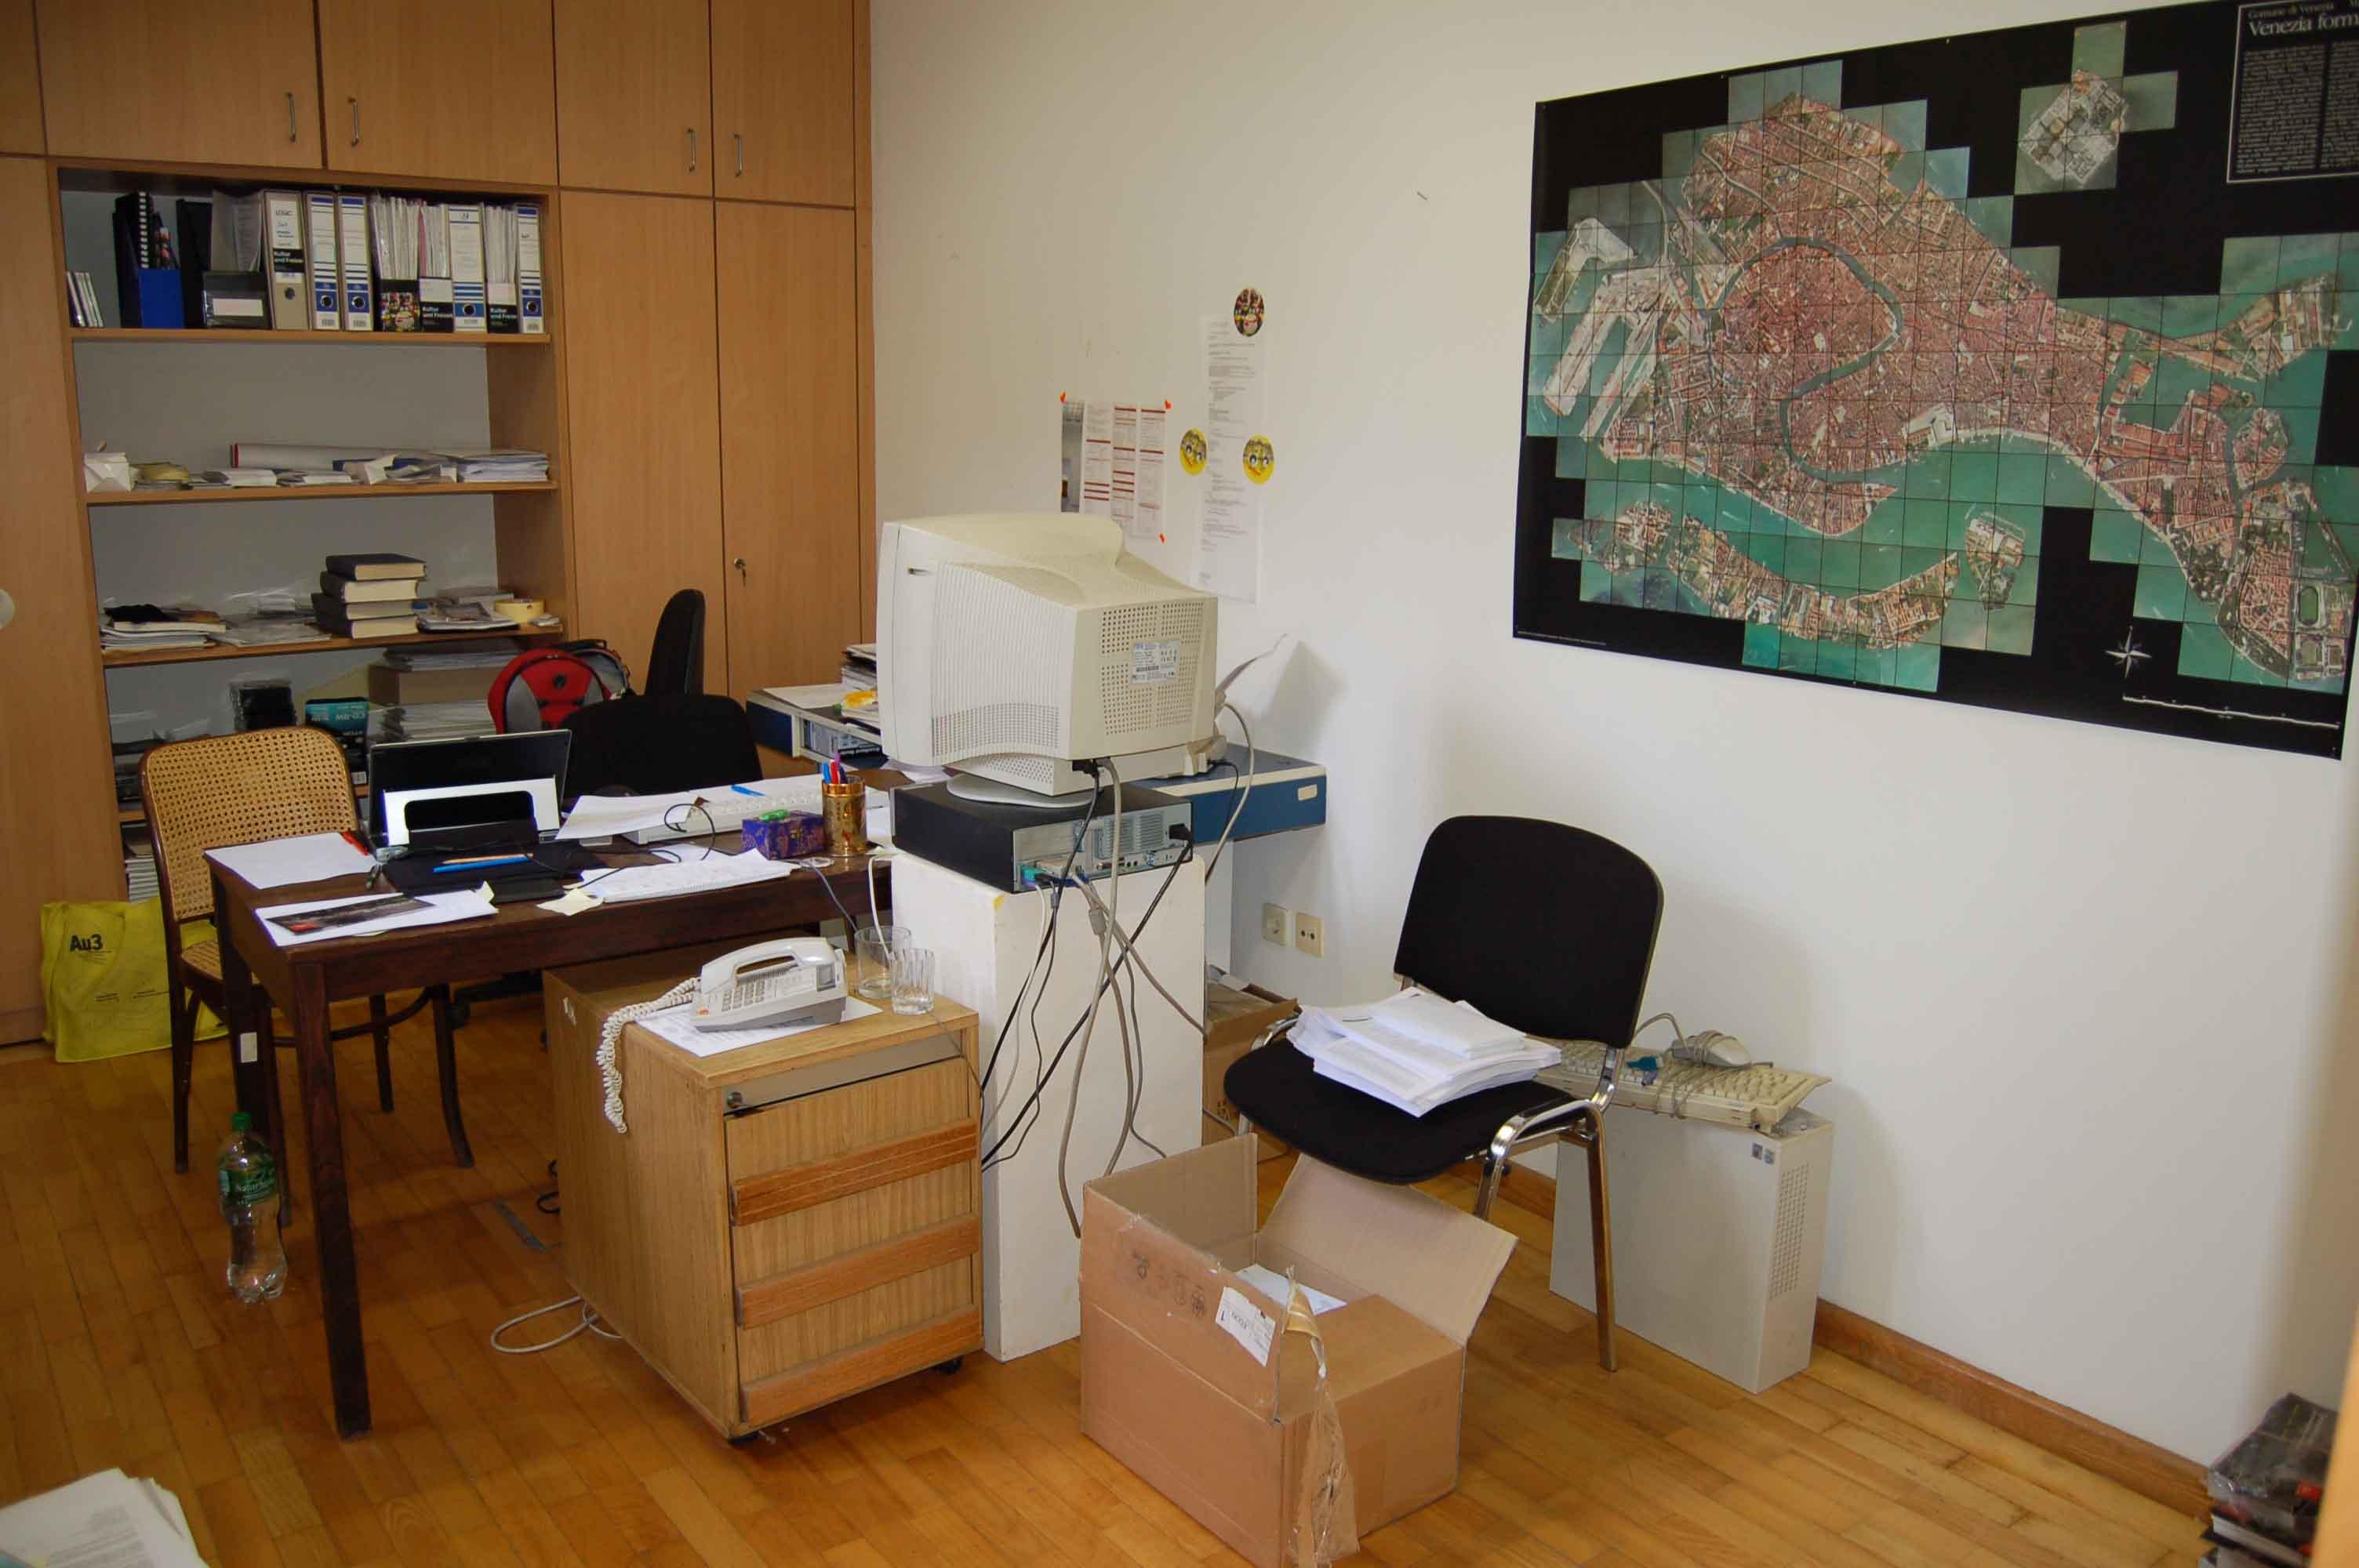 biennial_office.jpg